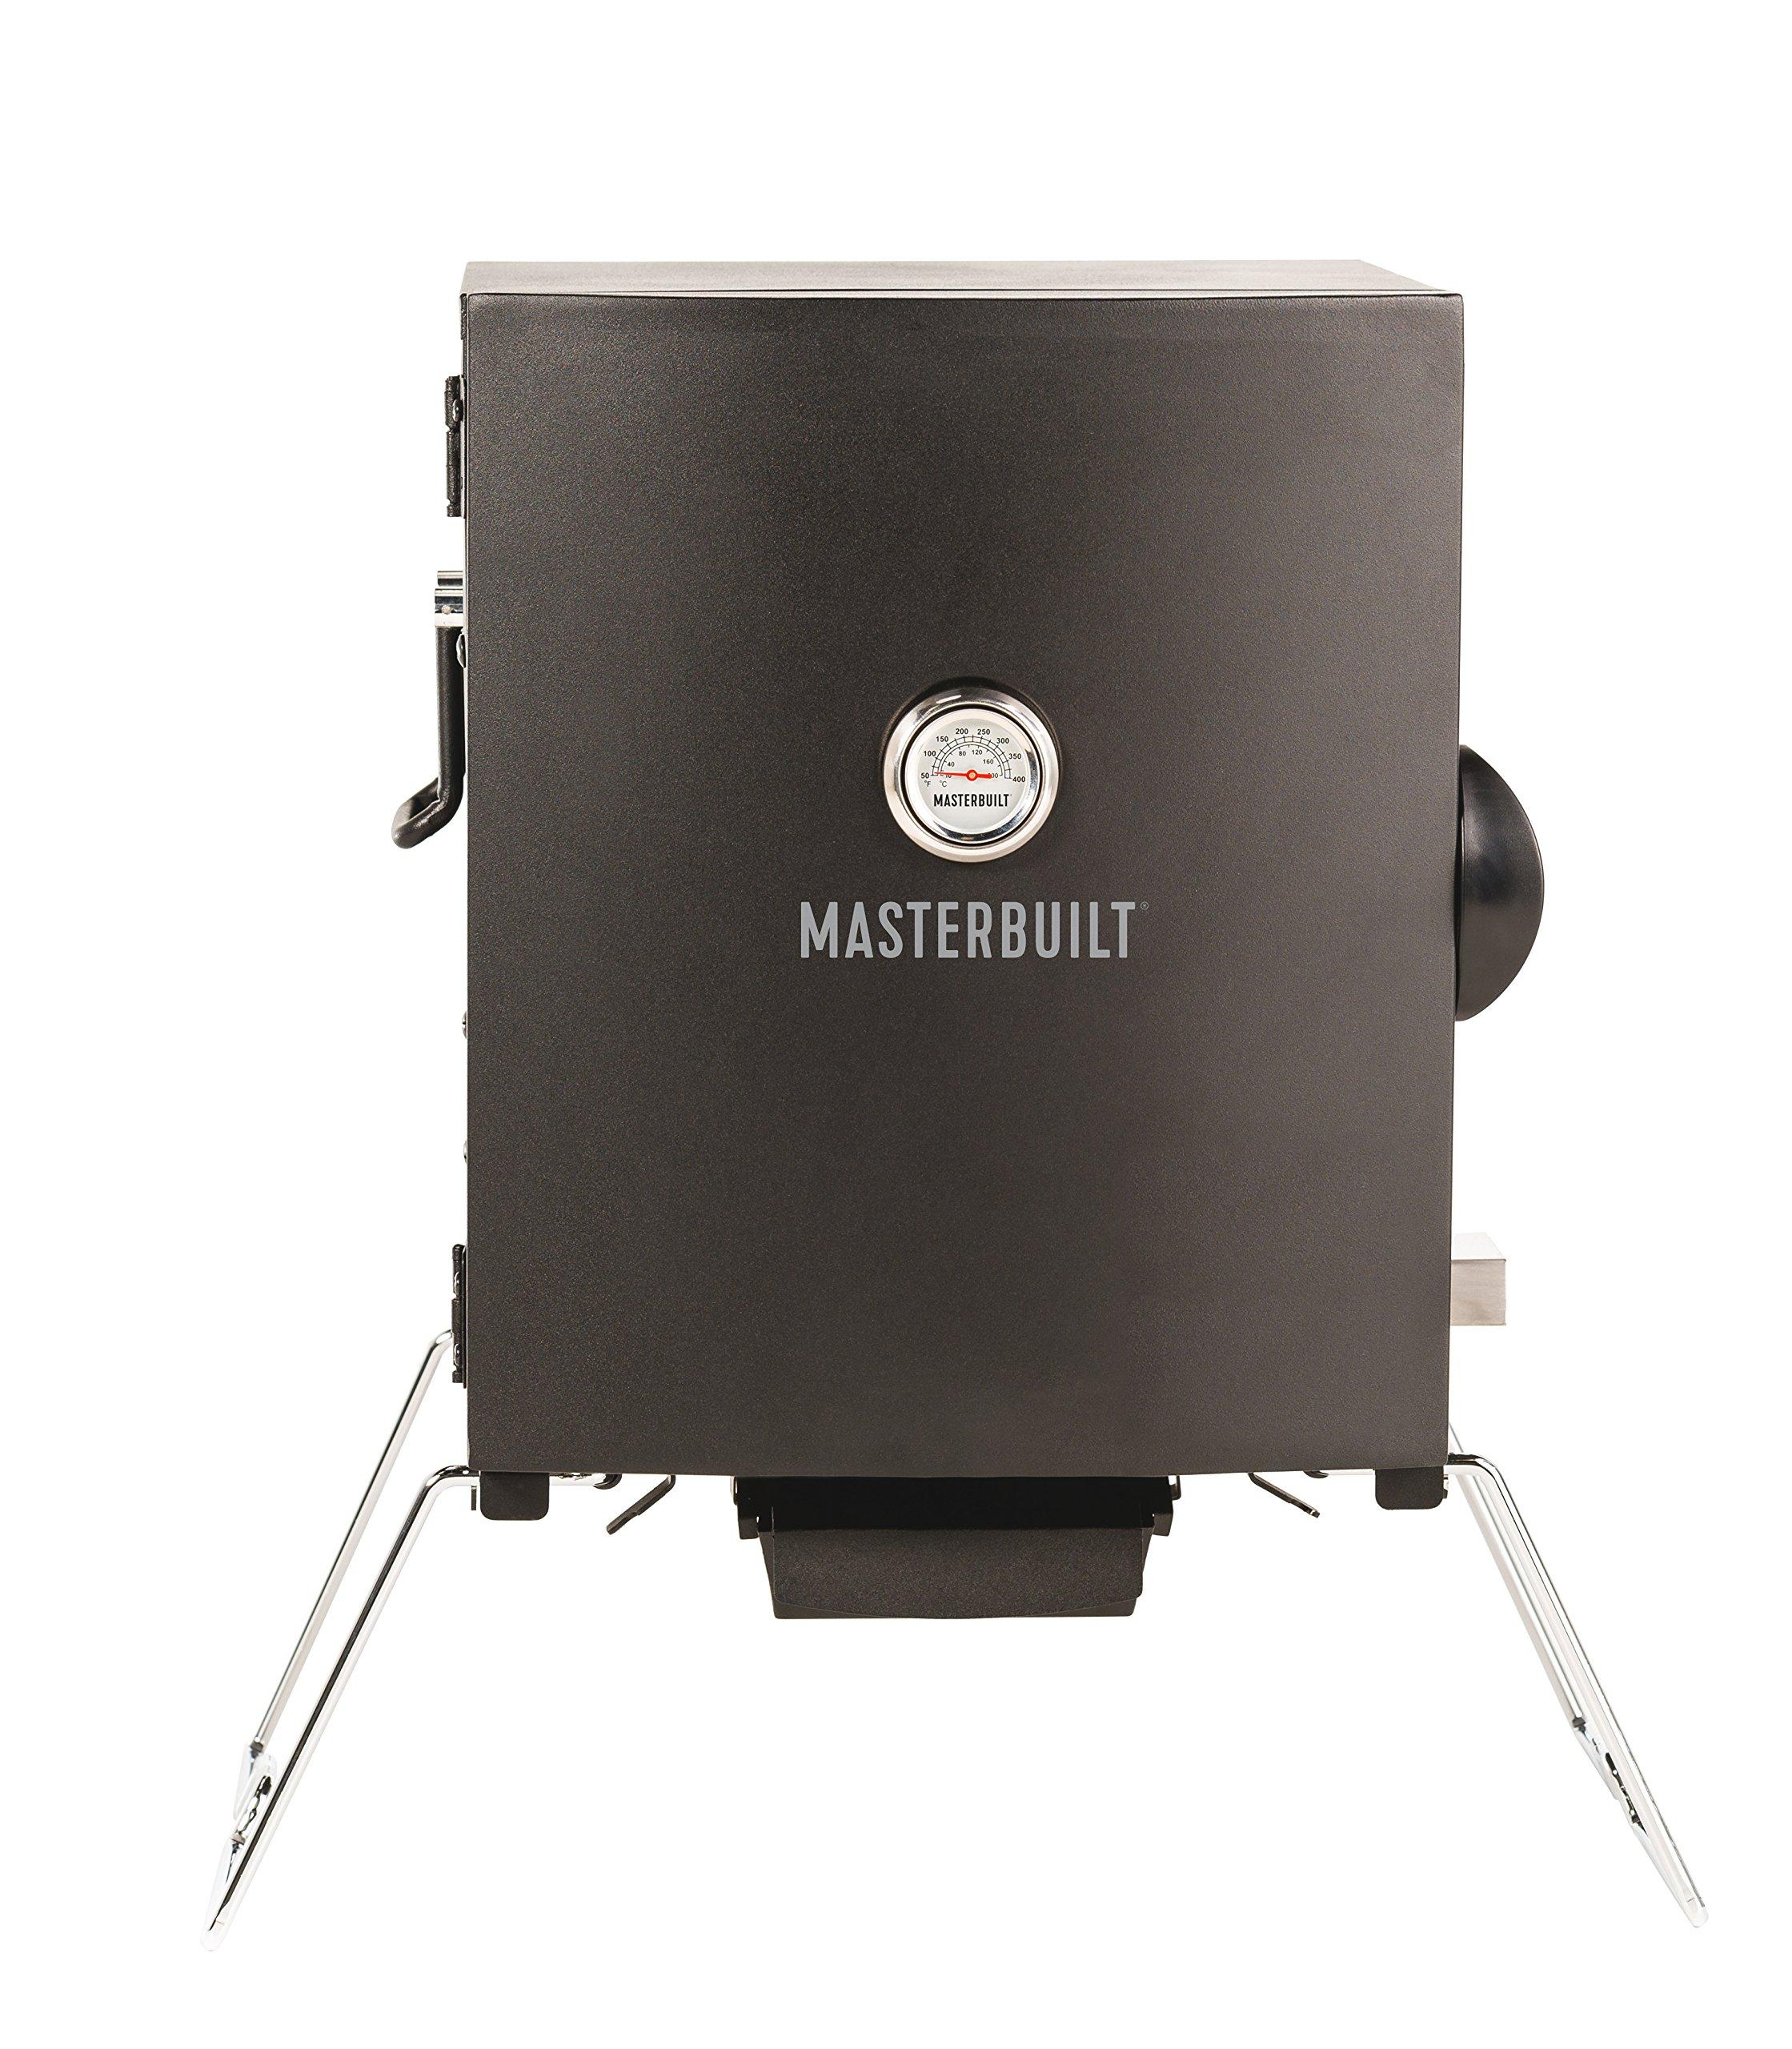 Masterbuilt MB20073716 Patio 2 Portable Electric Smoker